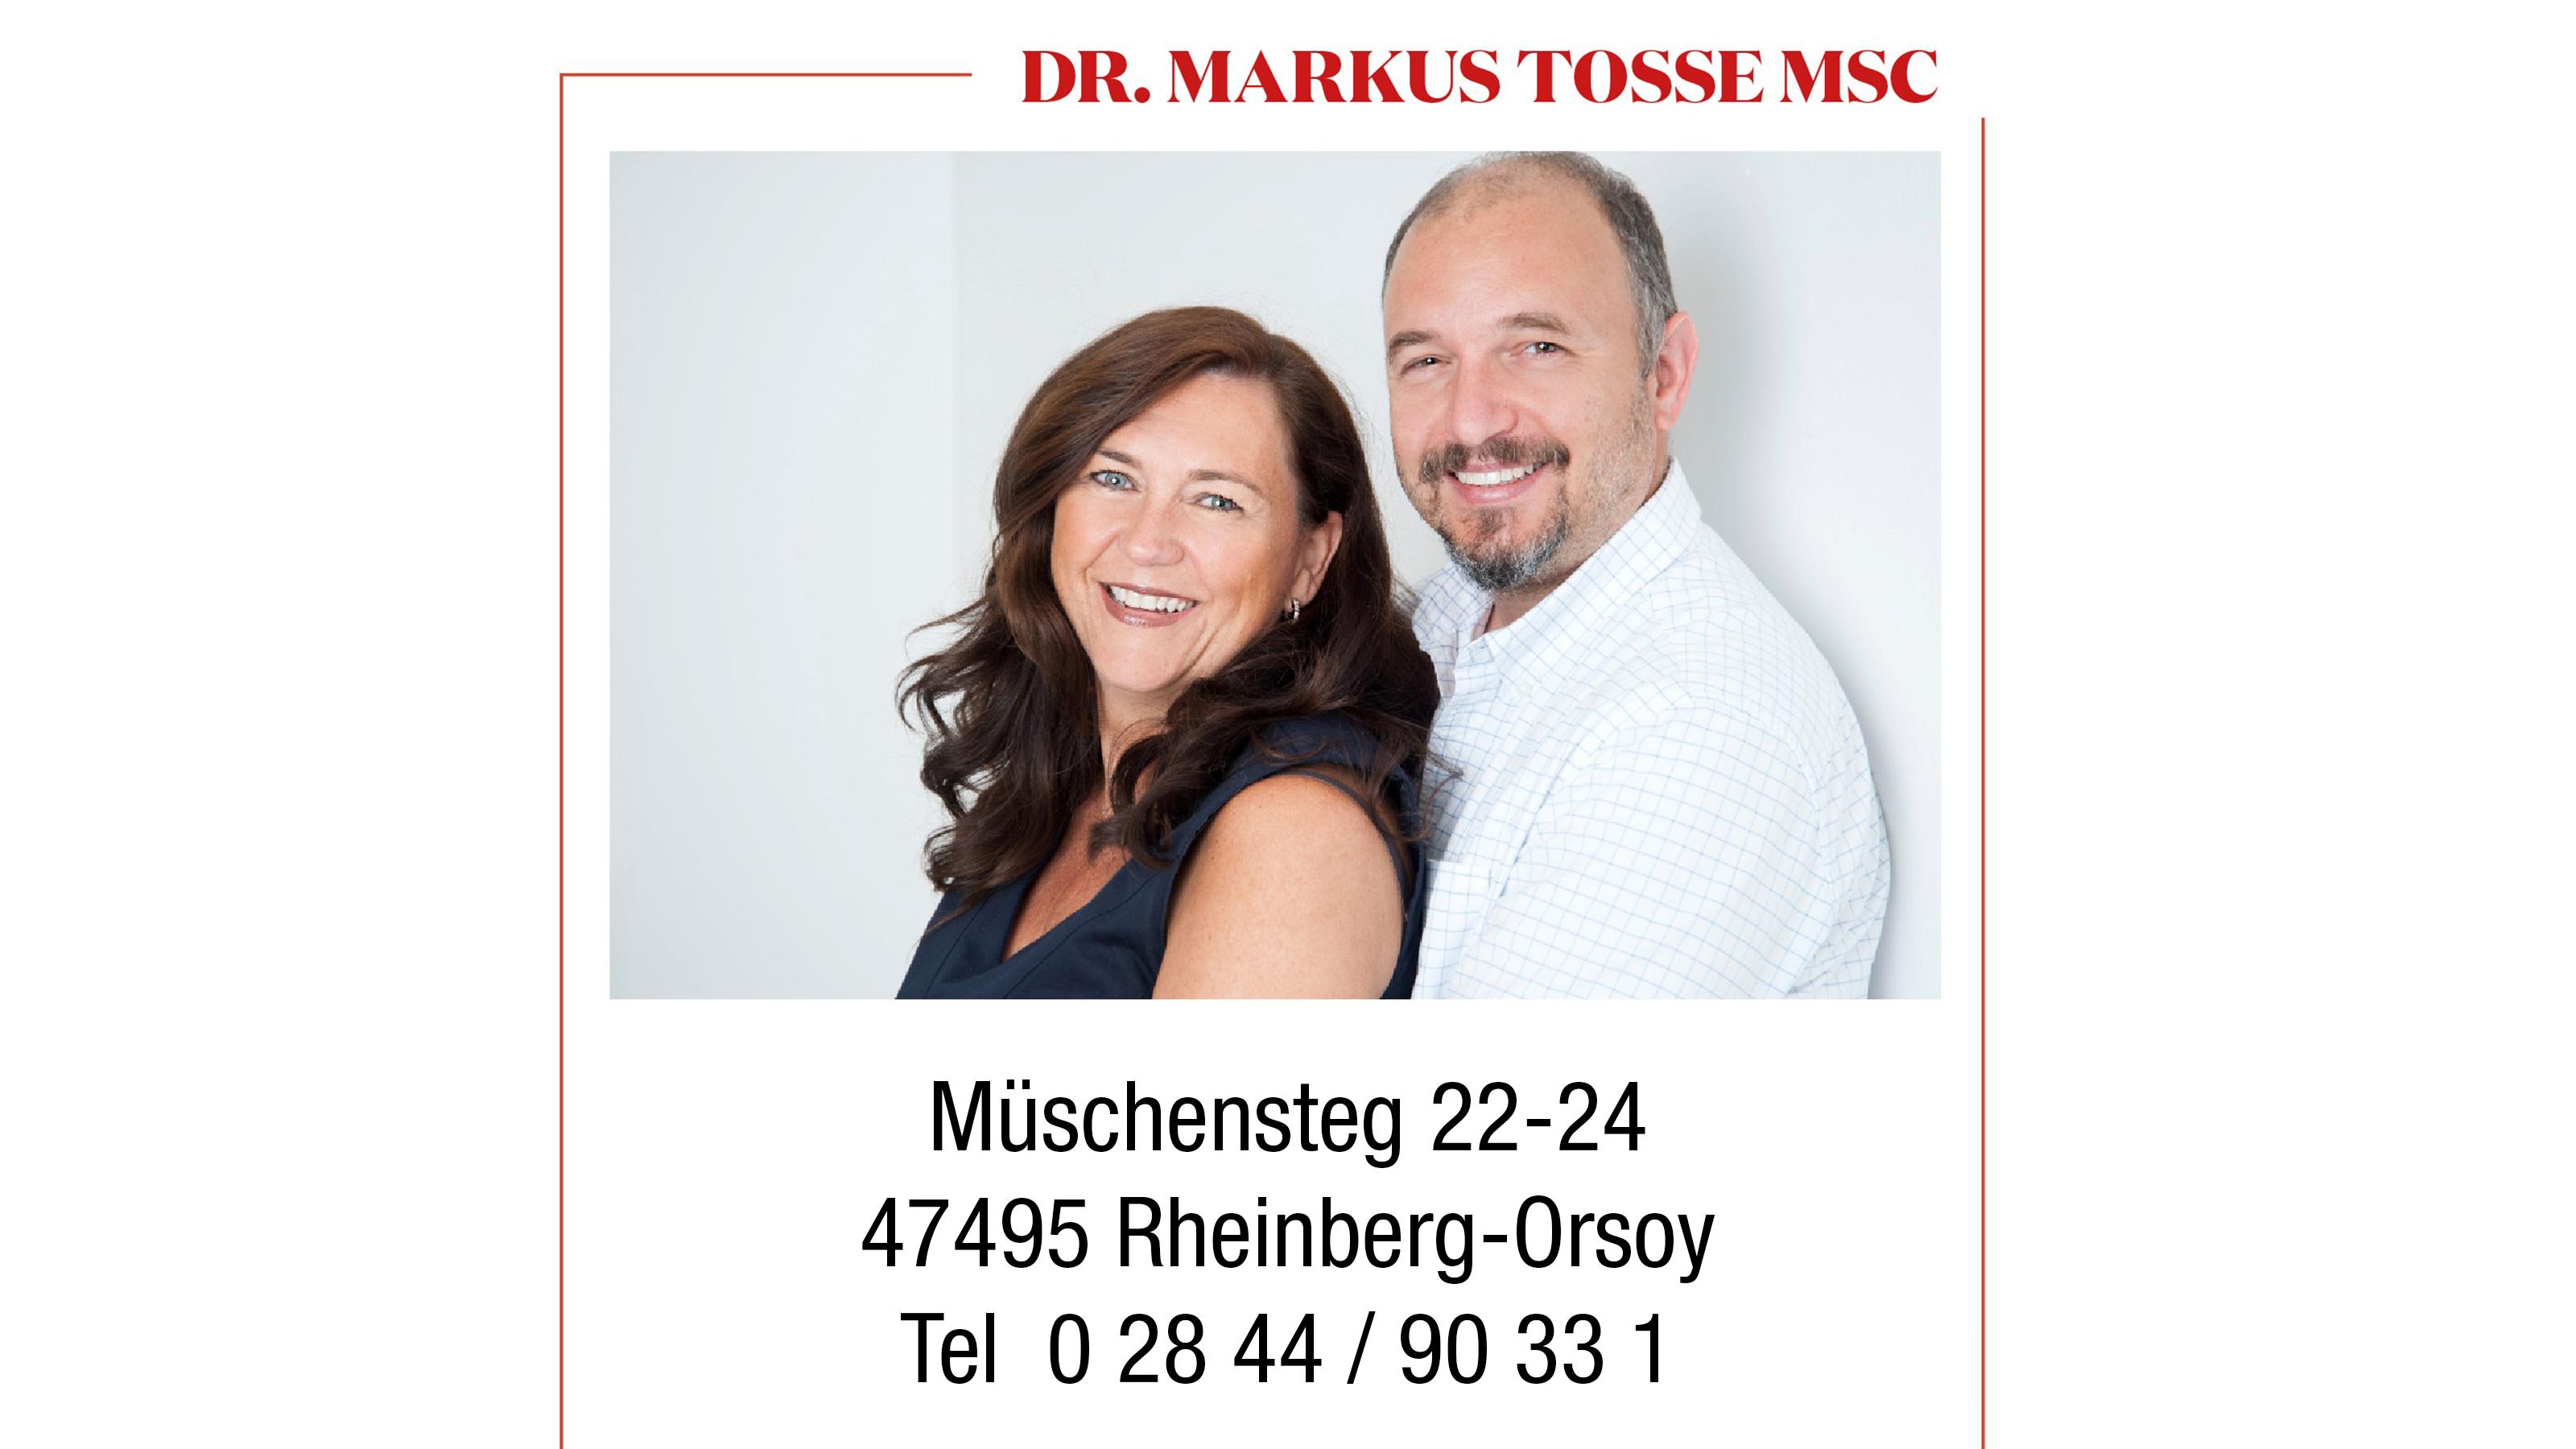 Zahnarzt Dr. Markus Tosse MSc